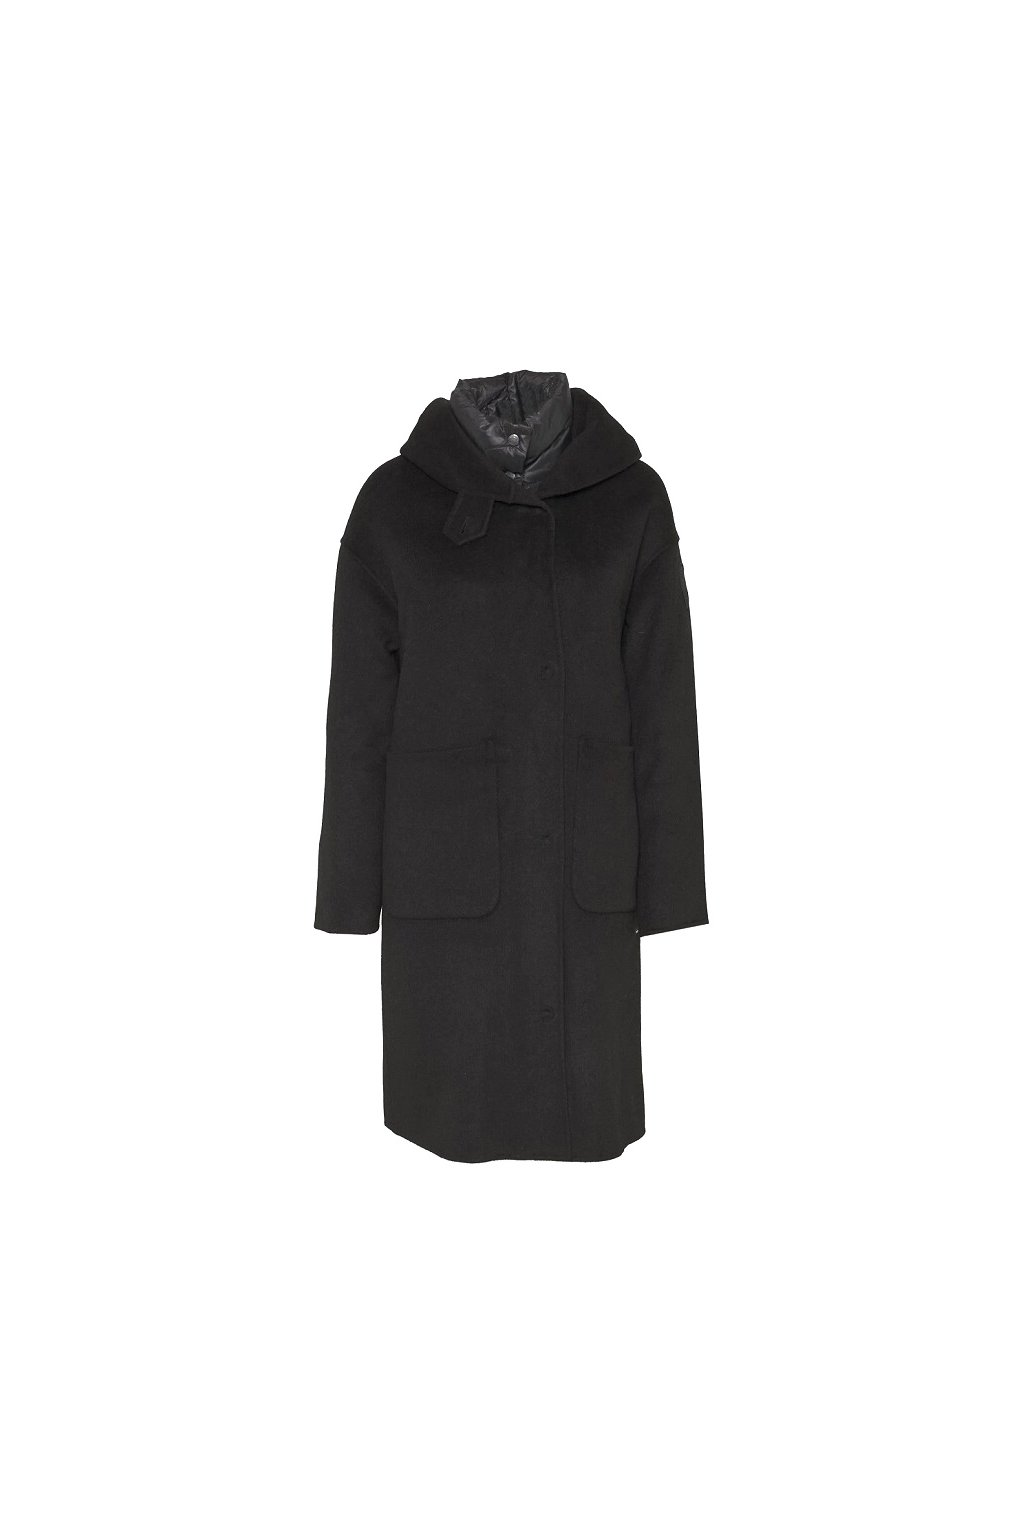 20WBLDK05031 999 Dámský kabát Blauer černý